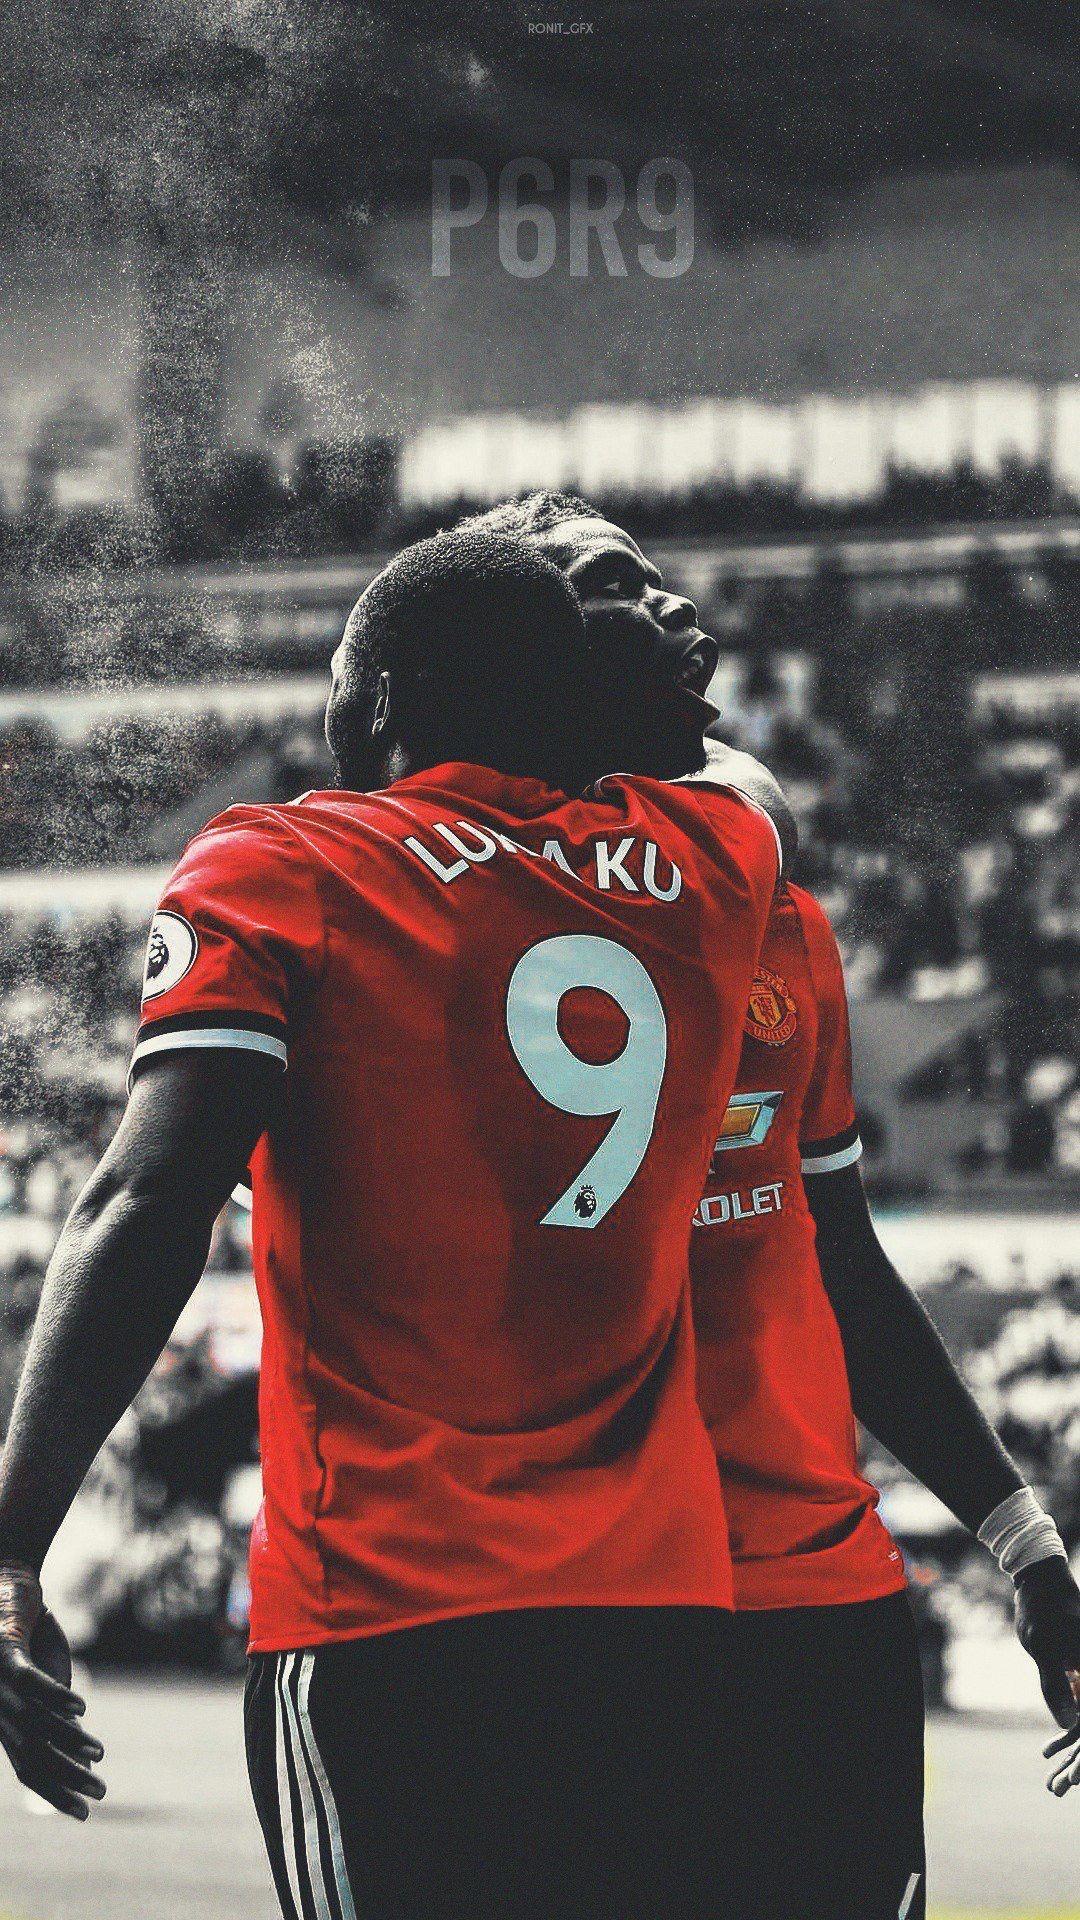 Lukaku Pogba Manchester United Manchester United 1080x1920